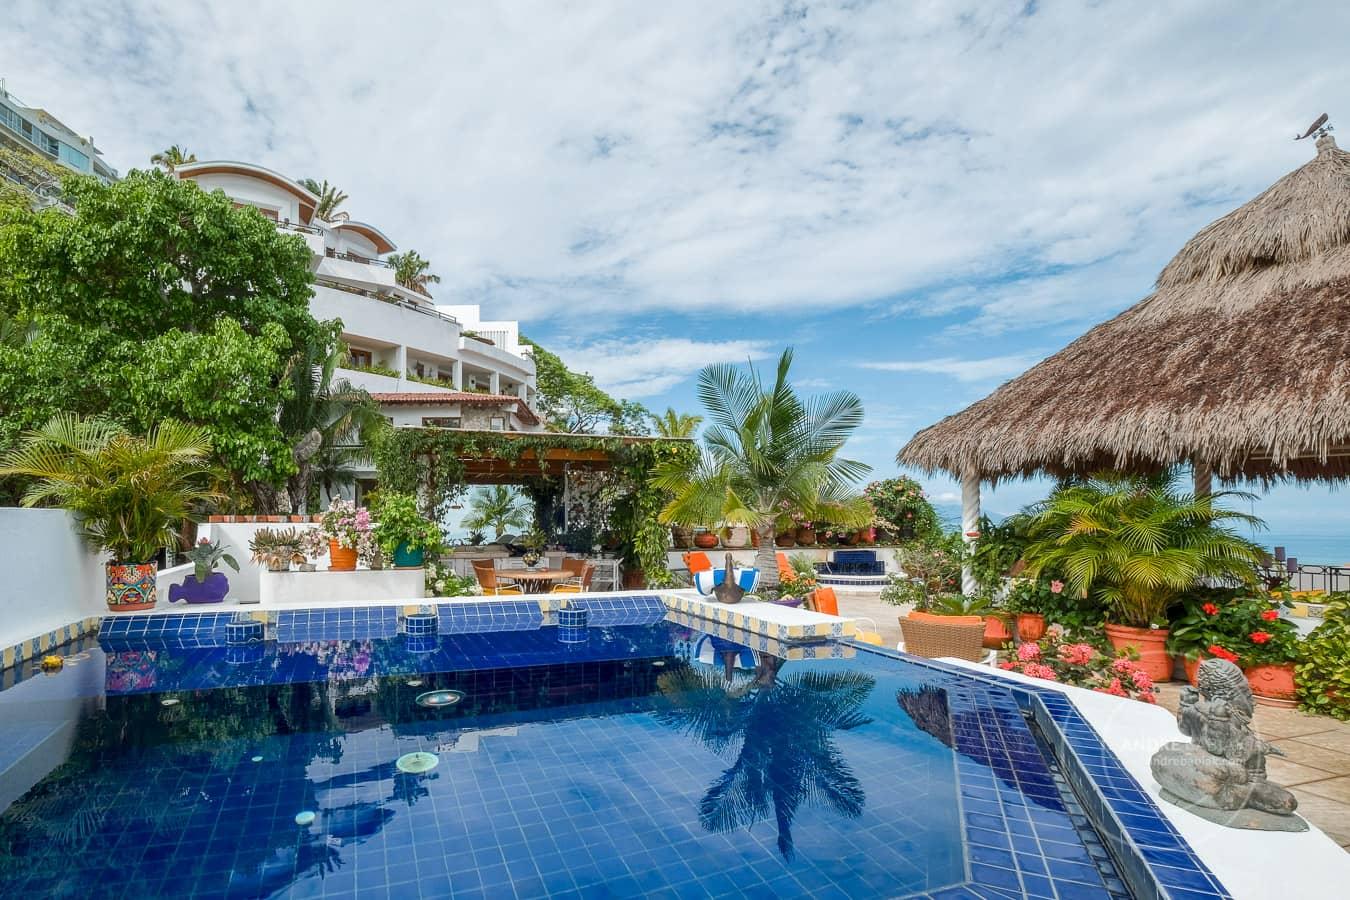 Architecture And Real Estate Photographer Puerto Vallarta 17